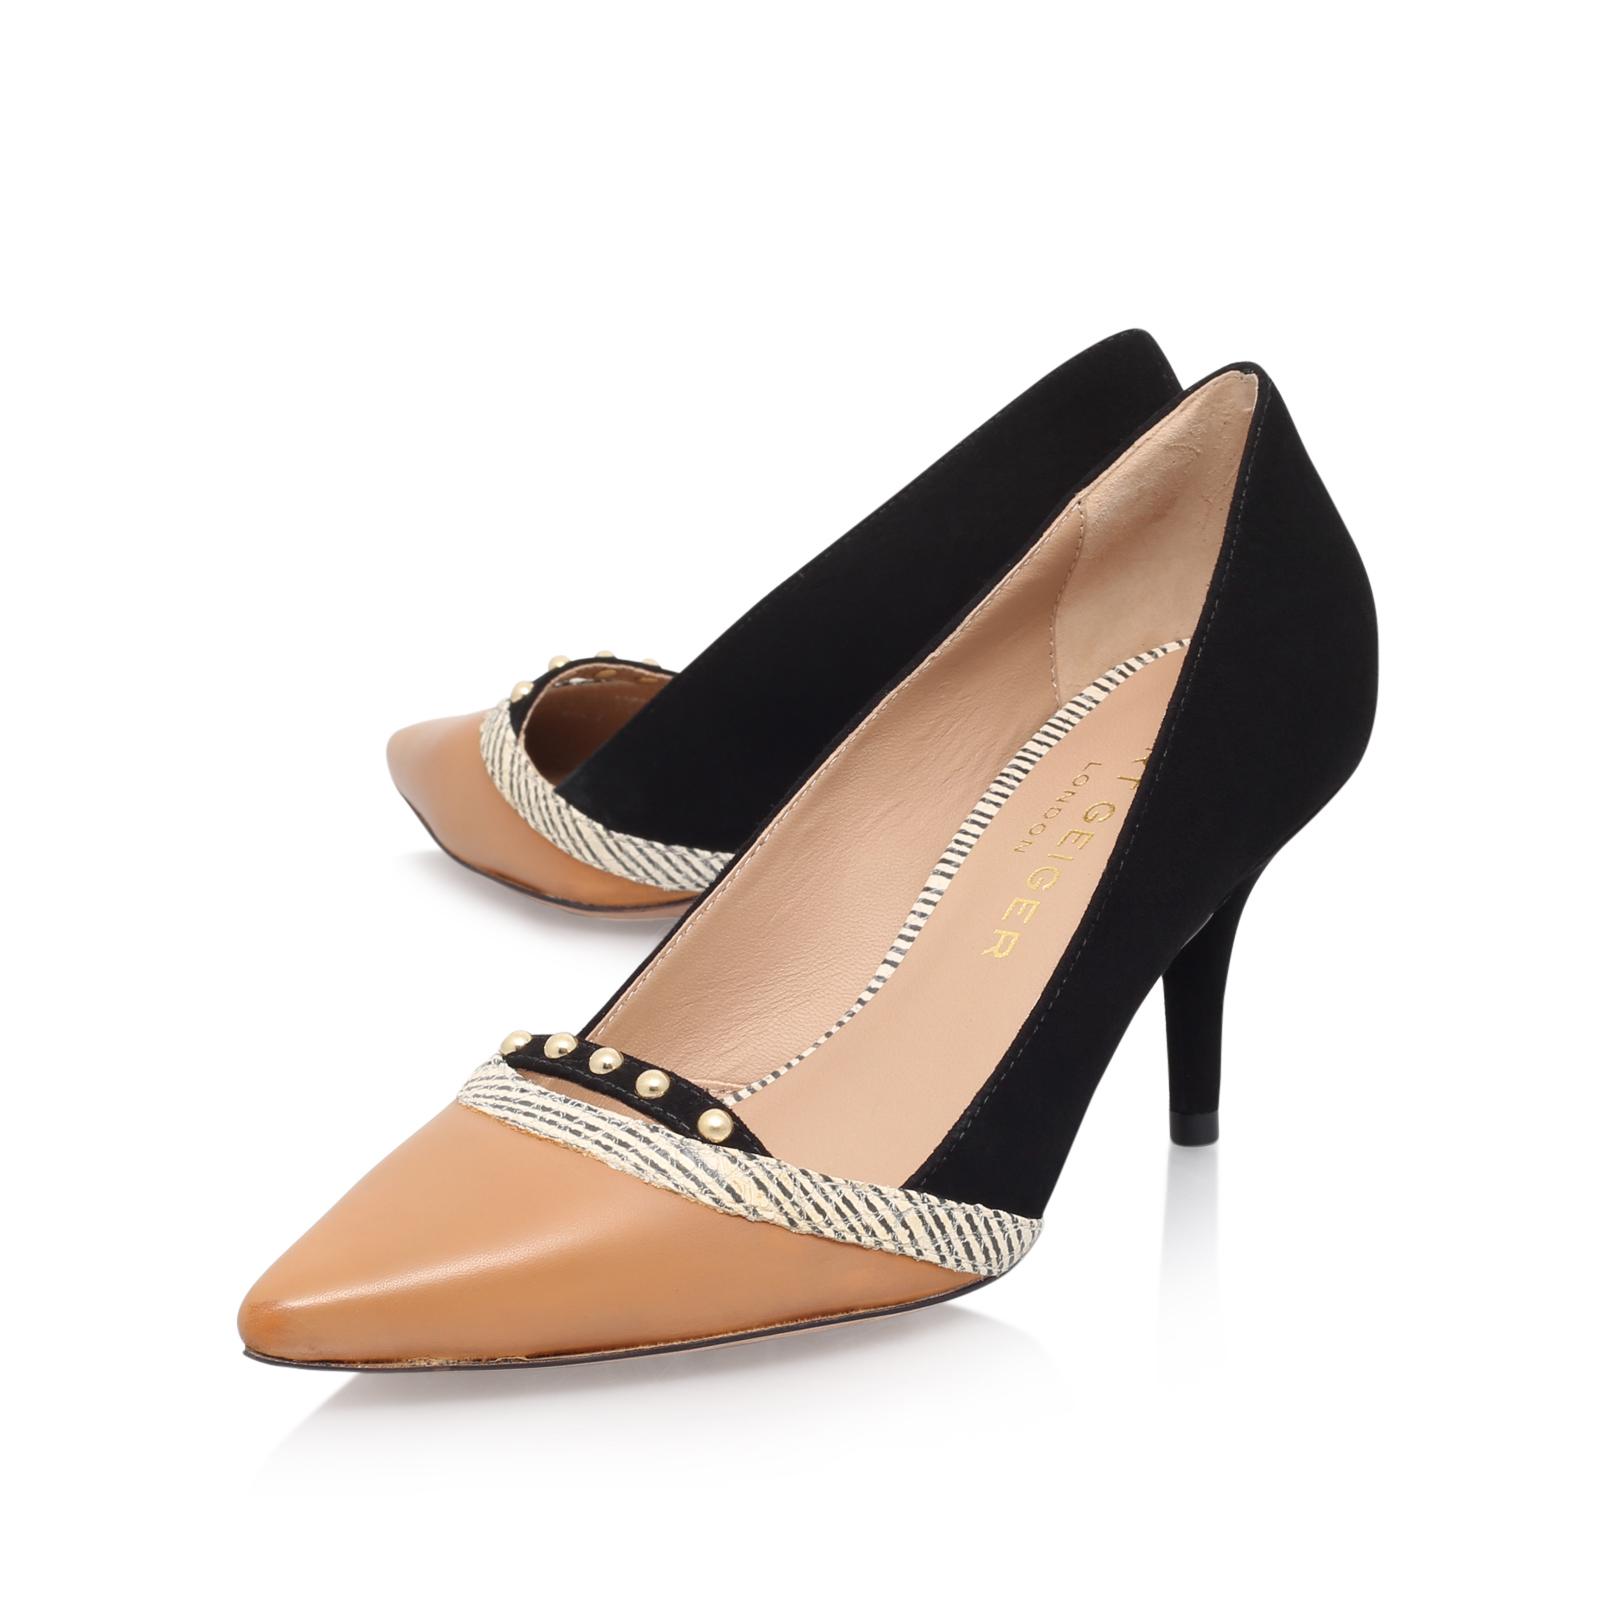 TIKKI Kurt Geiger Tikki Black Leather Mid Heel Court Shoes by KURT GEIGER  LONDON